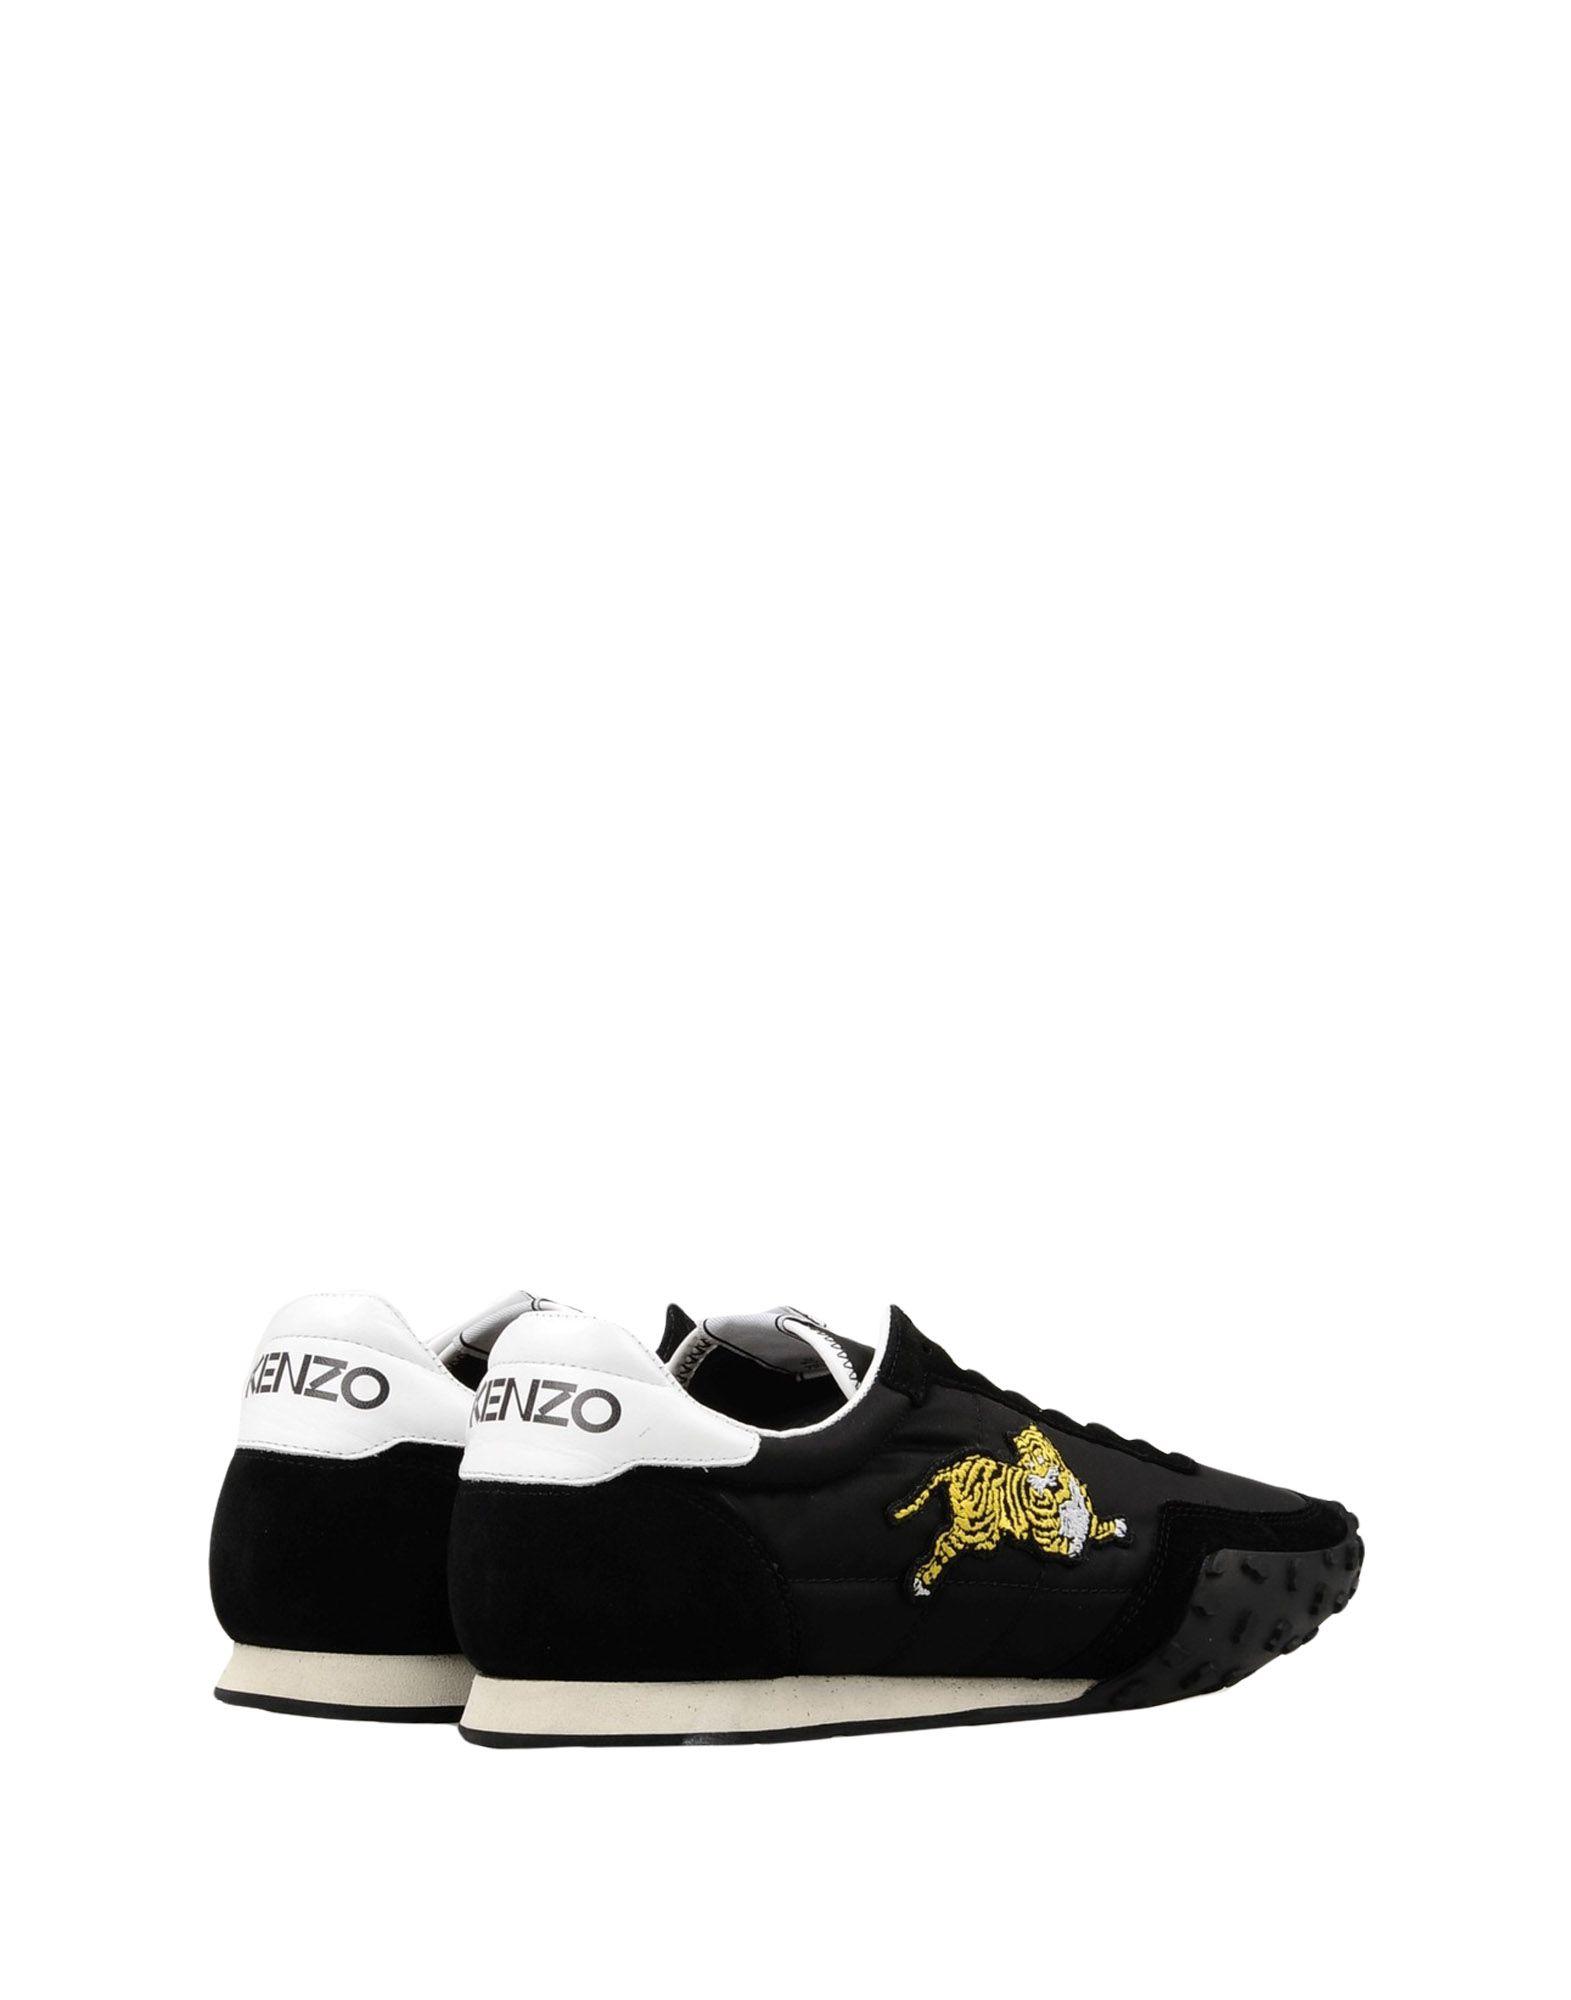 Kenzo 11430752FN Baskets Basses Main  11430752FN Kenzo Gute Qualität beliebte Schuhe 7e5133